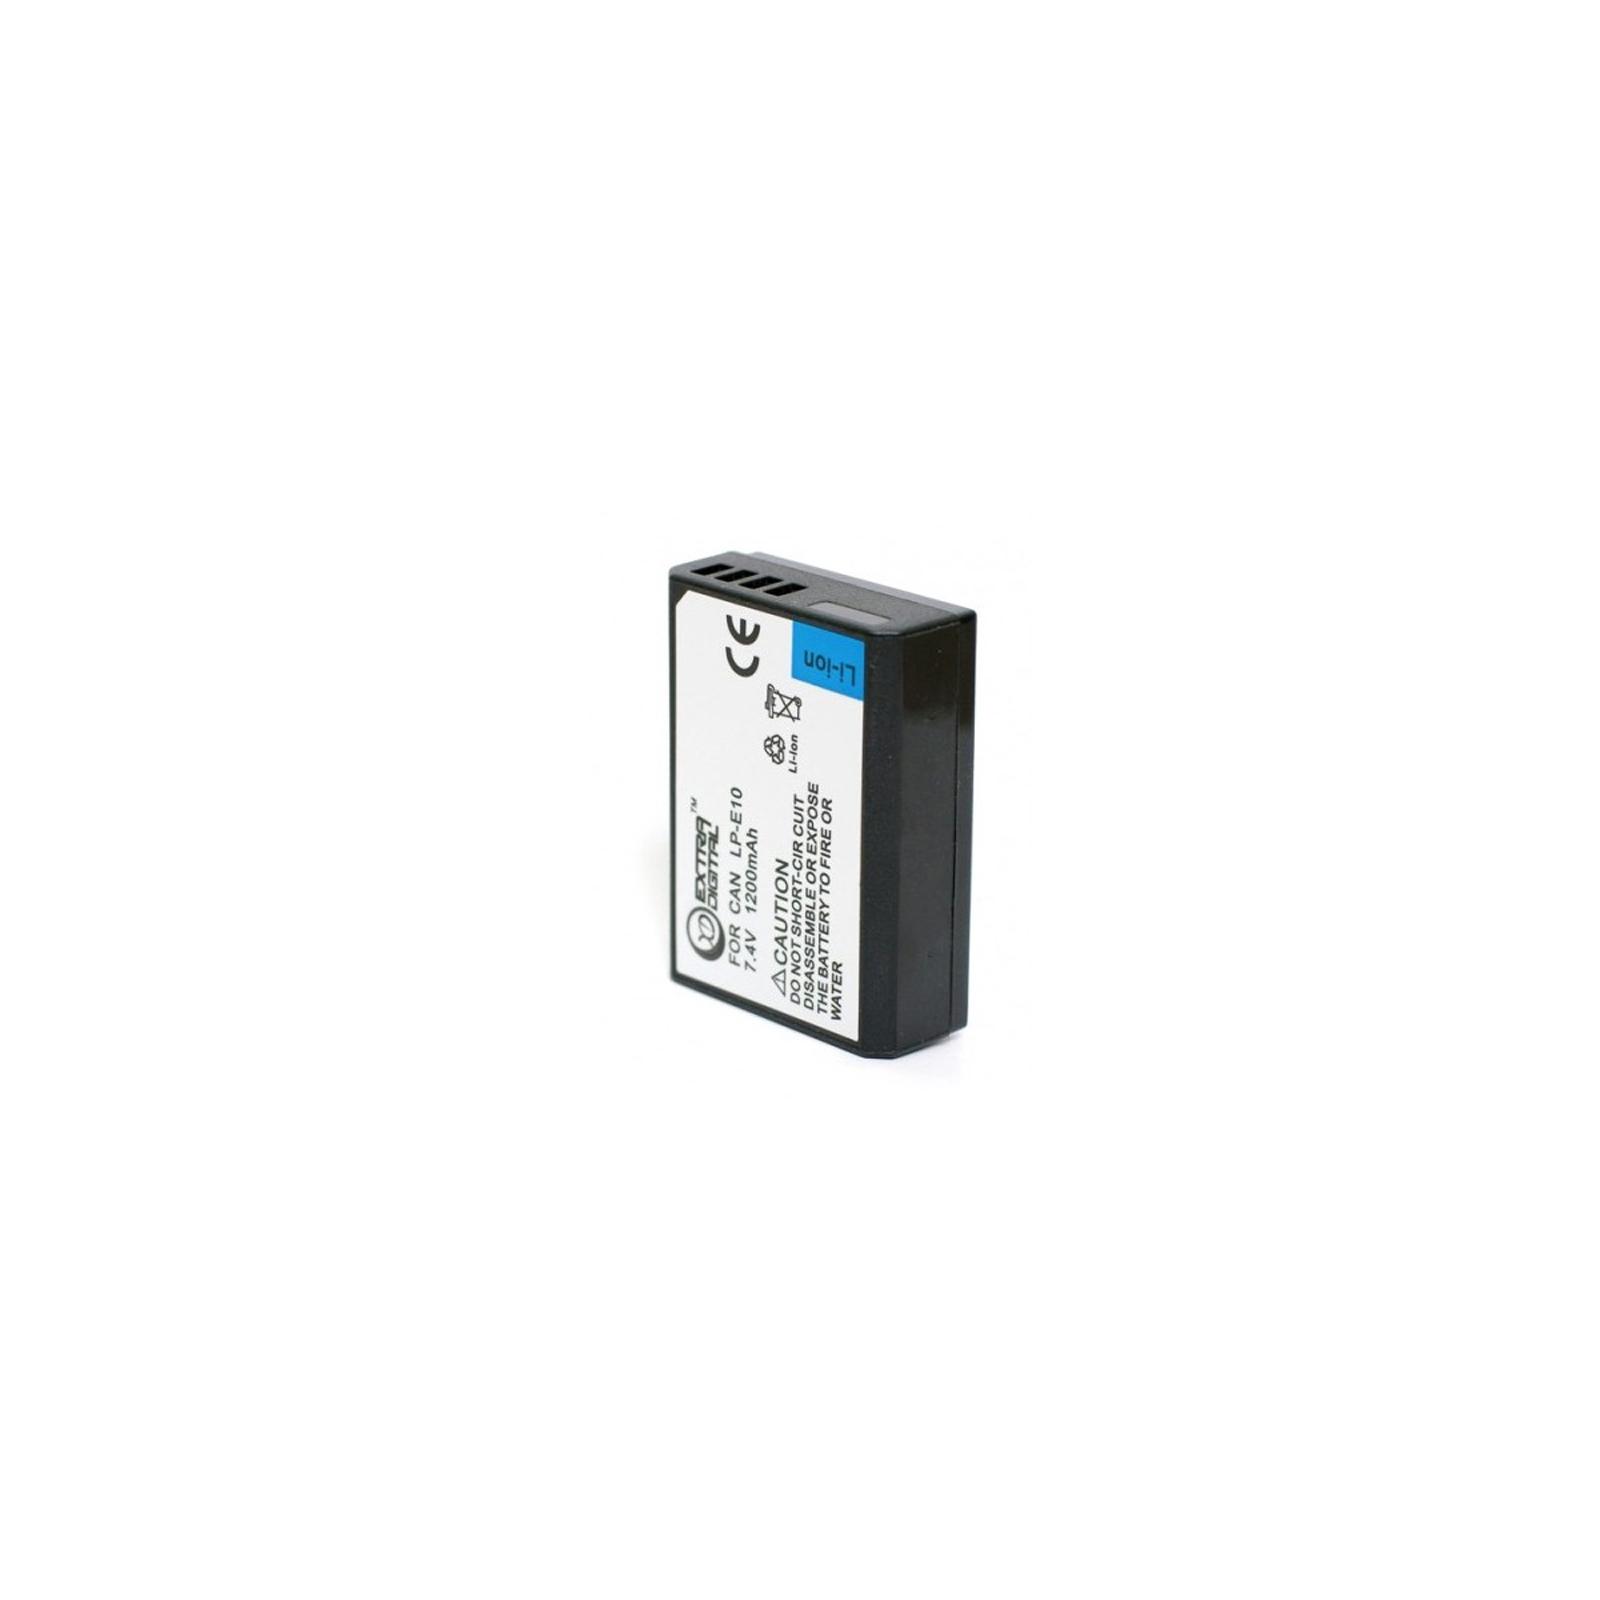 Аккумулятор к фото/видео EXTRADIGITAL Canon LP-E10 (BDC2427) изображение 2